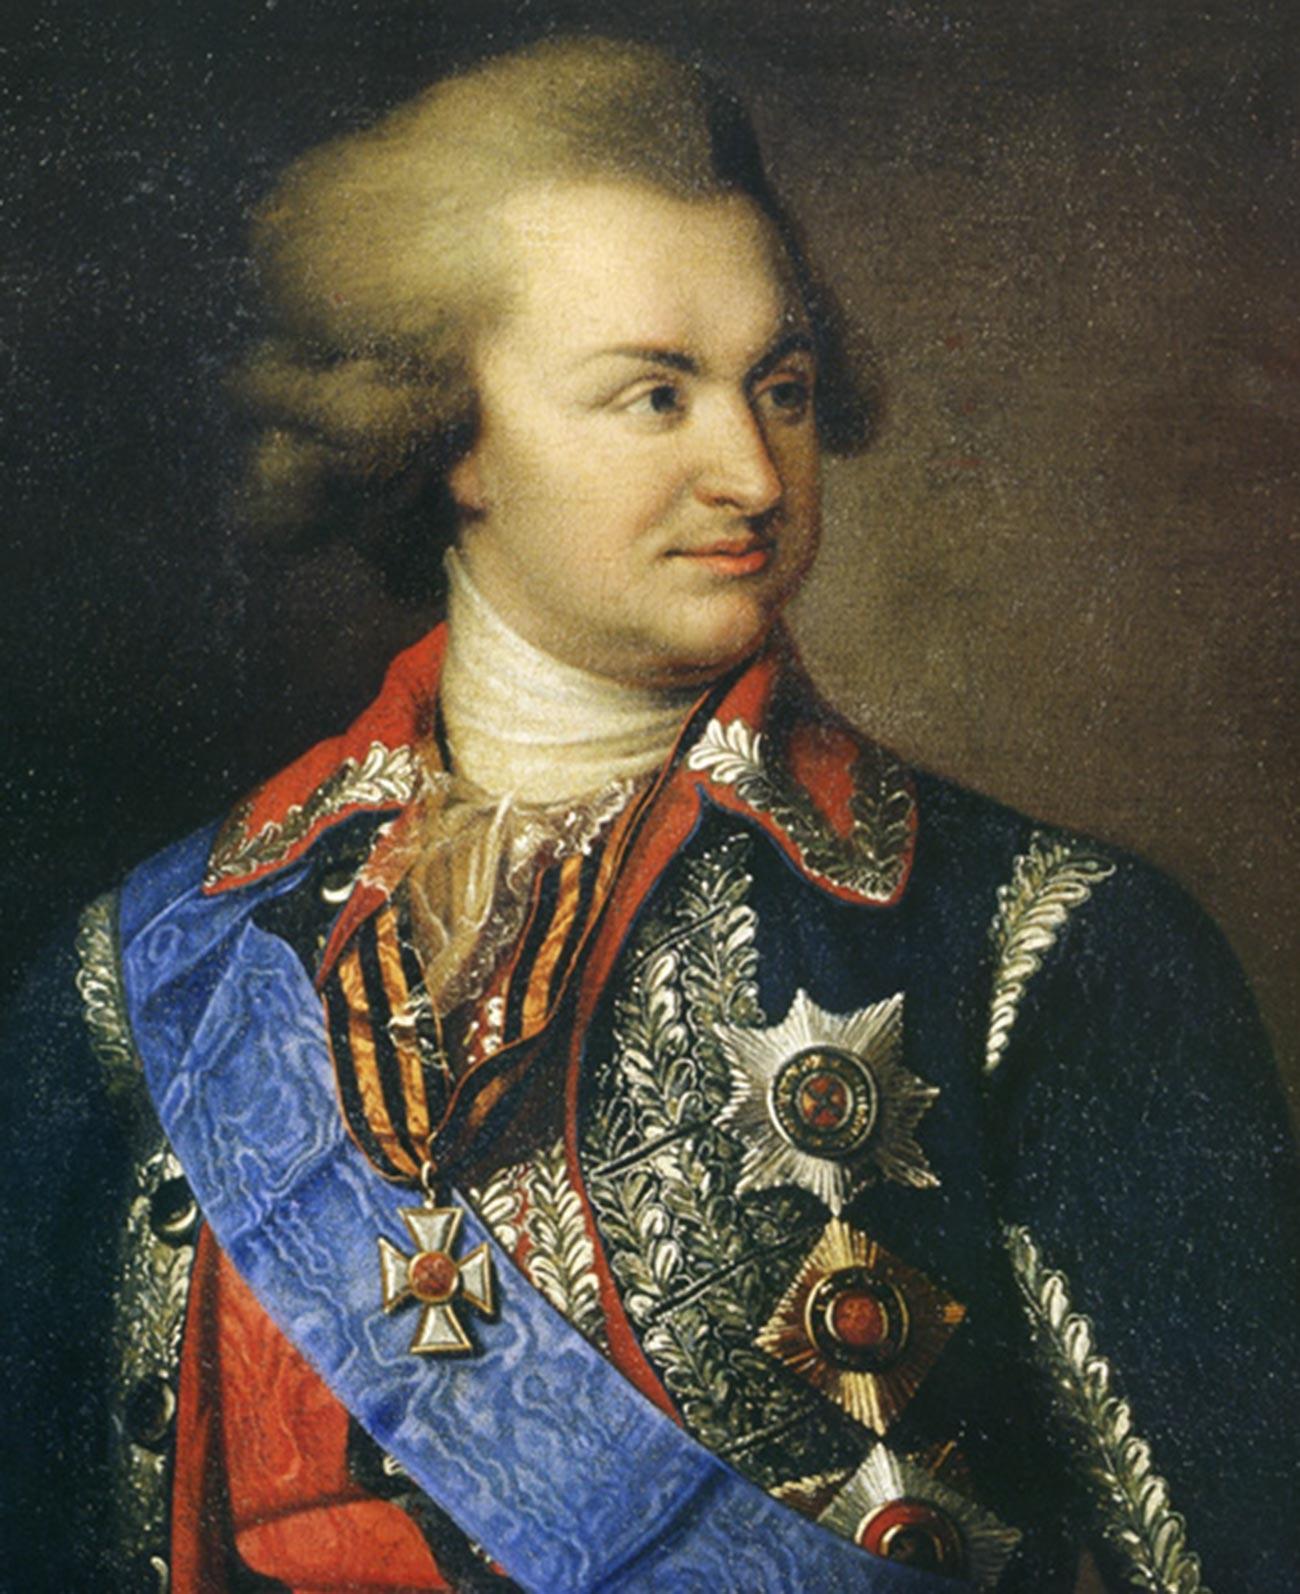 His Serene Highness Prince Grigory Potemkin.